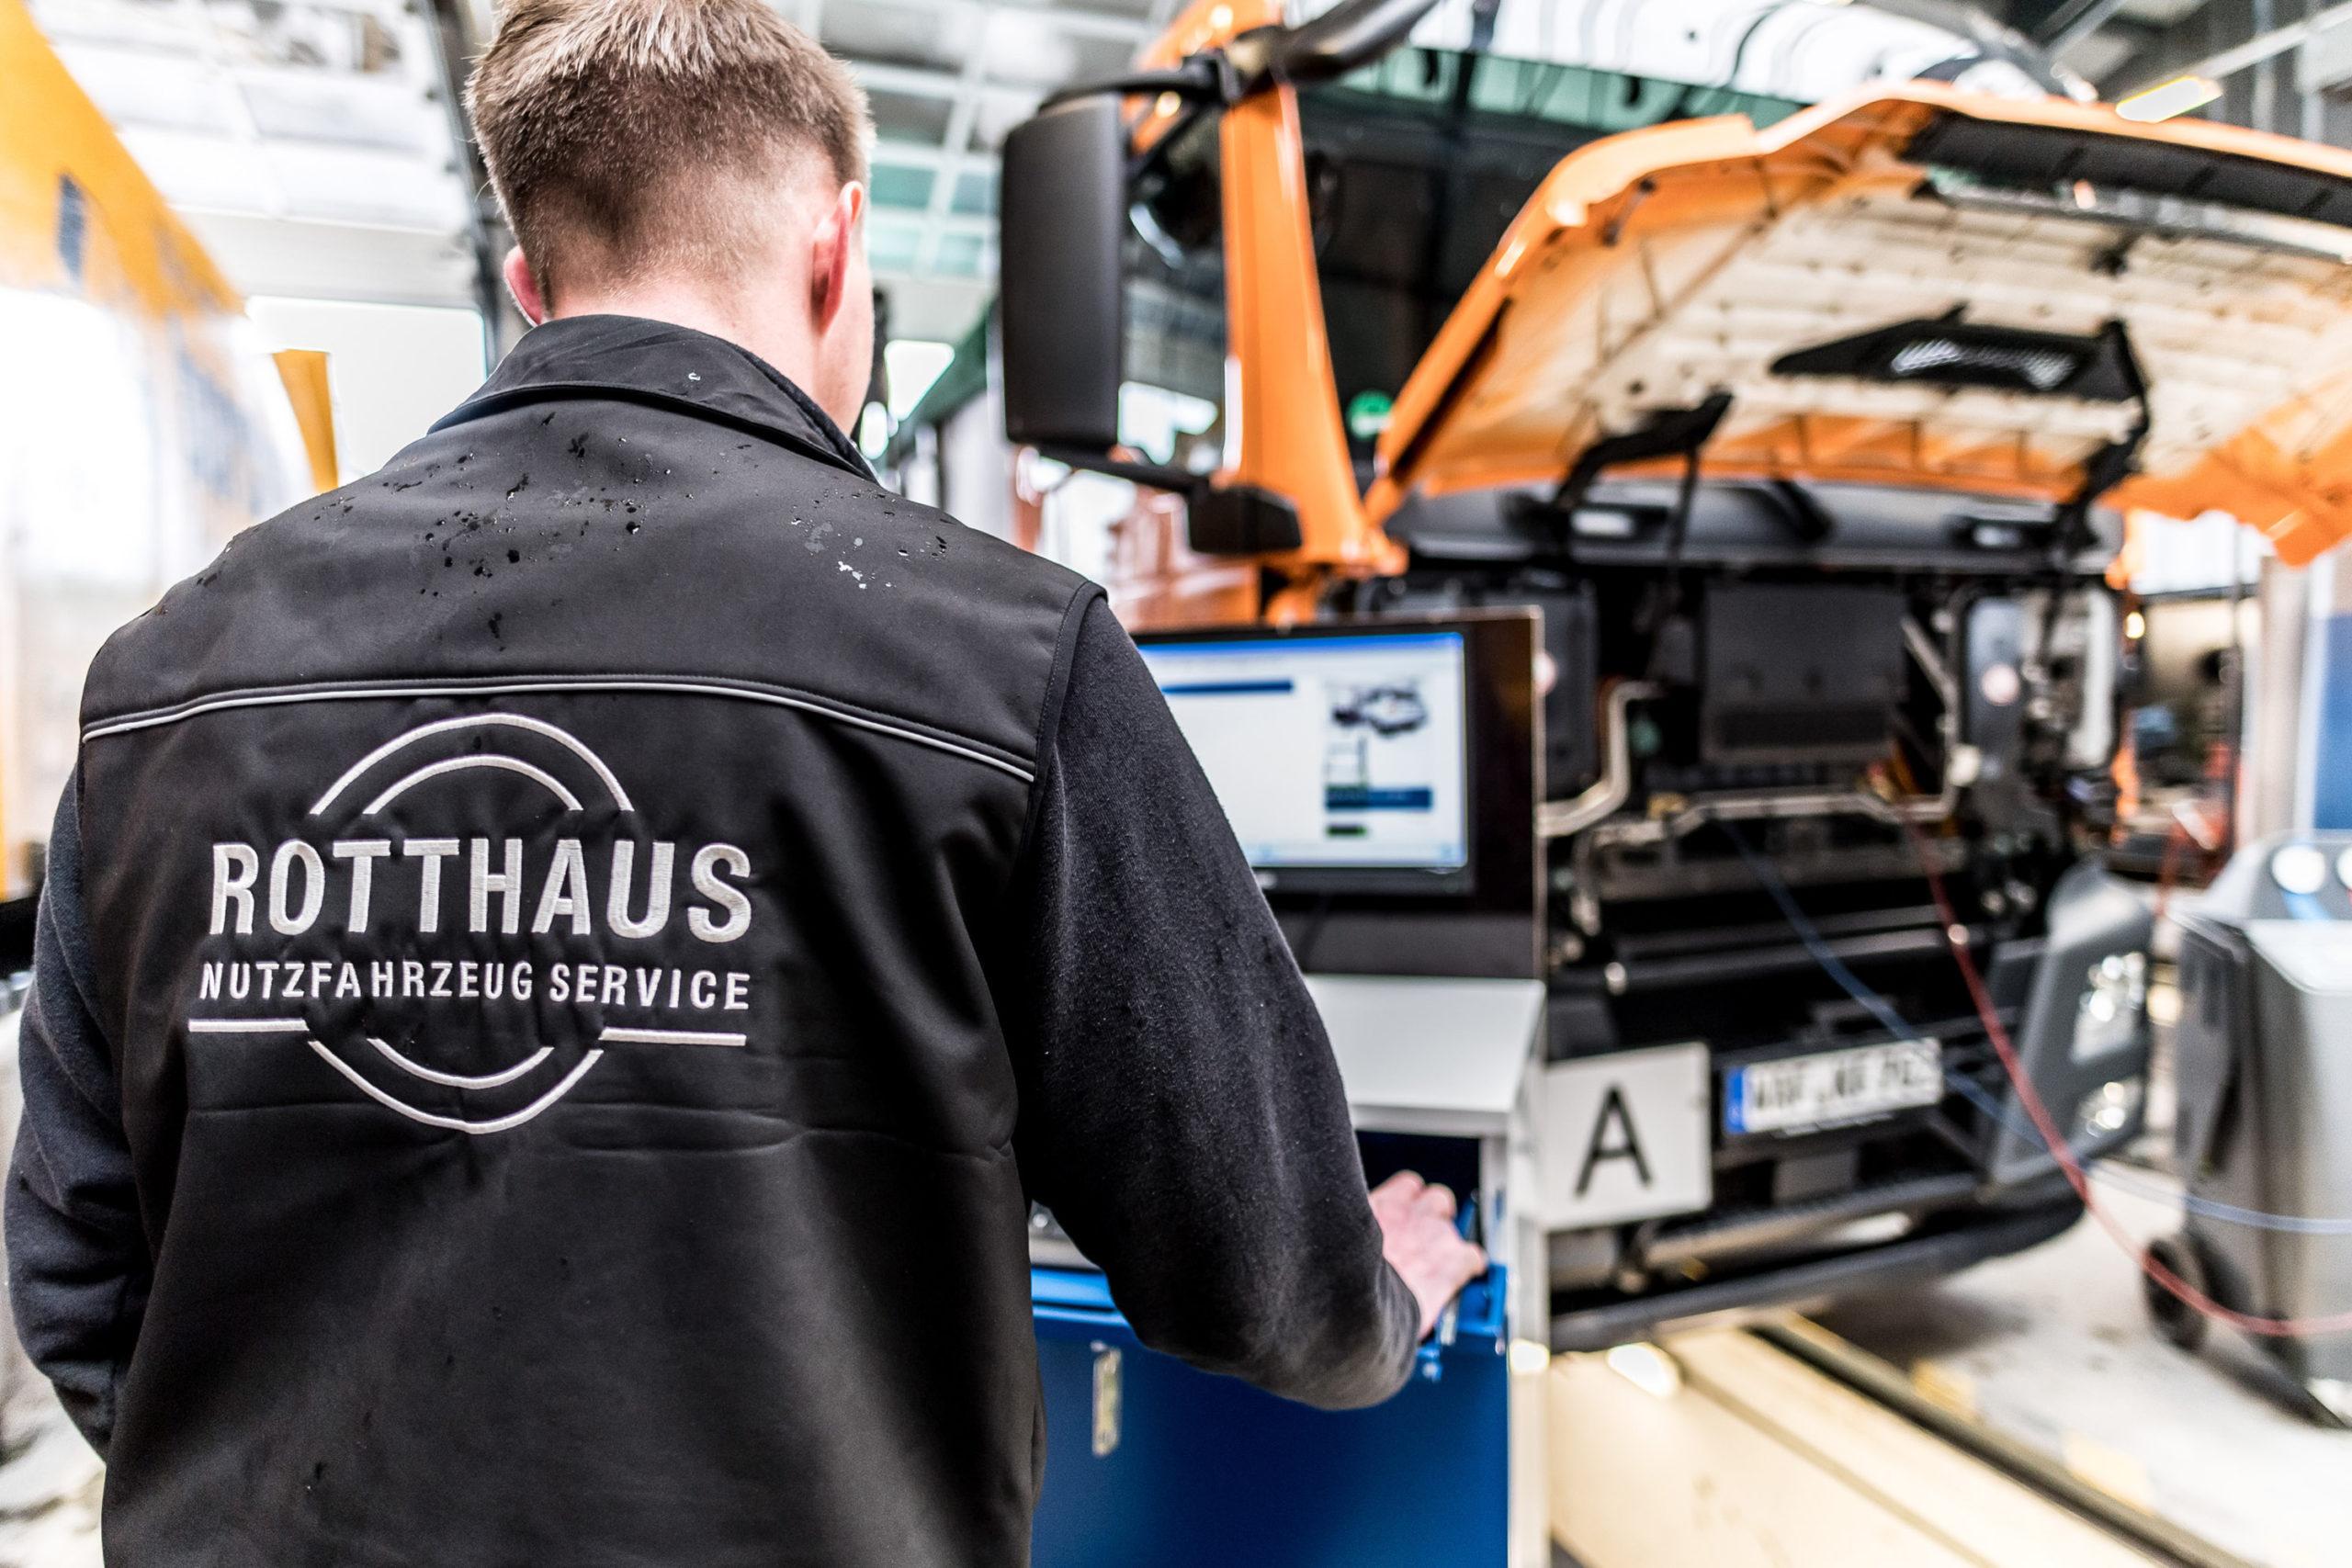 Rotthaus Nutzfahrzeug Service GmbH